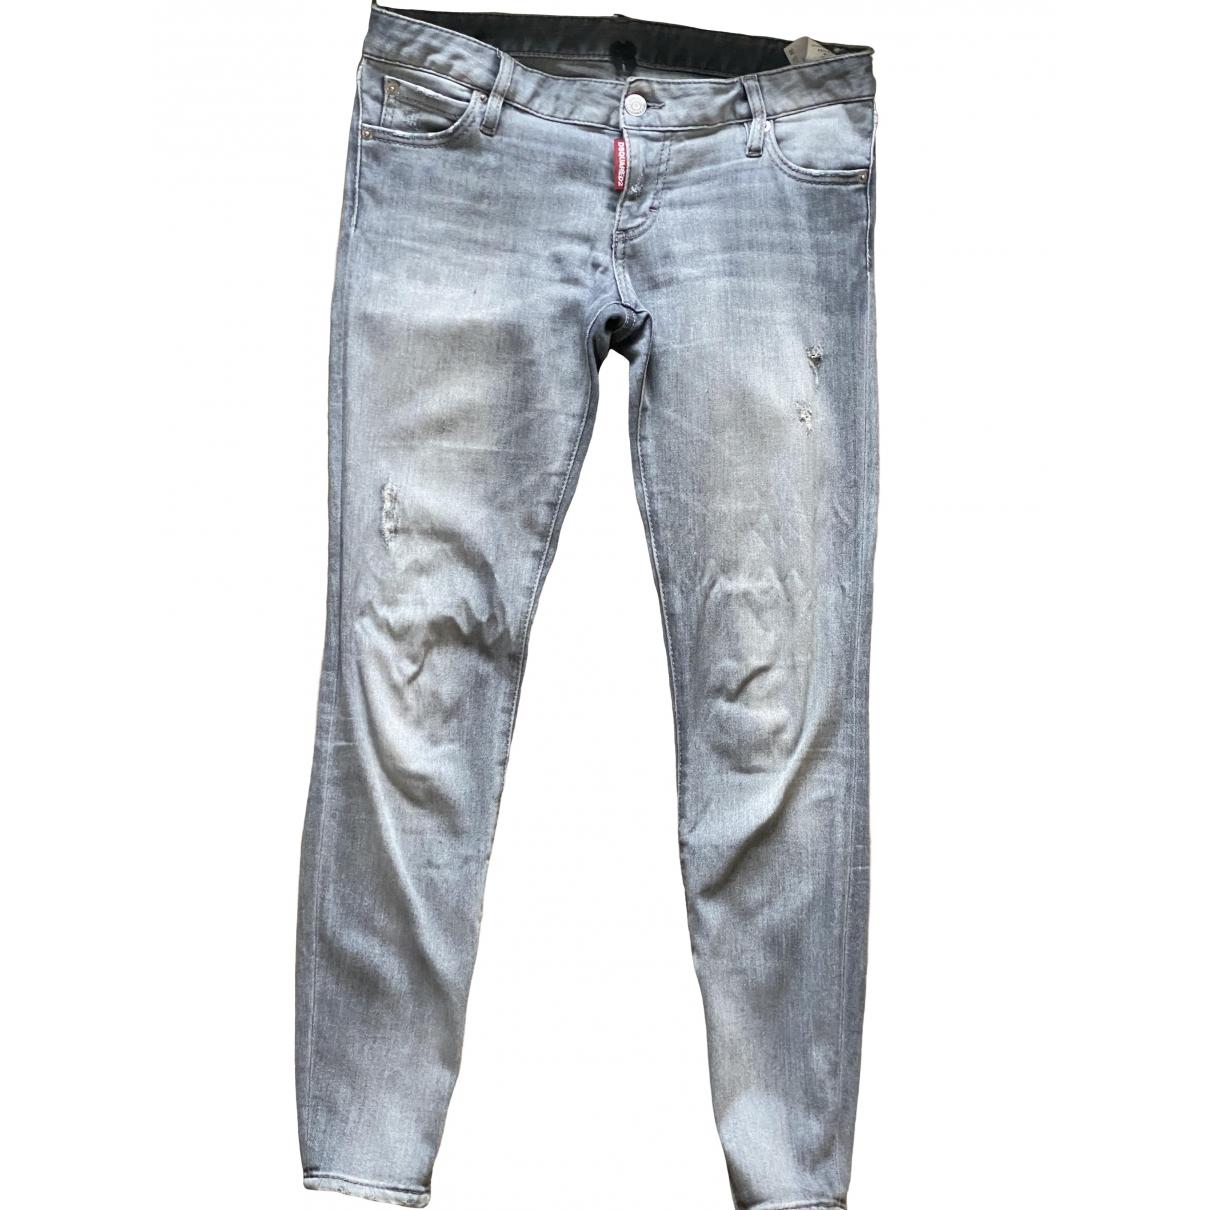 Dsquared2 \N Grey Denim - Jeans Jeans for Women 34 FR